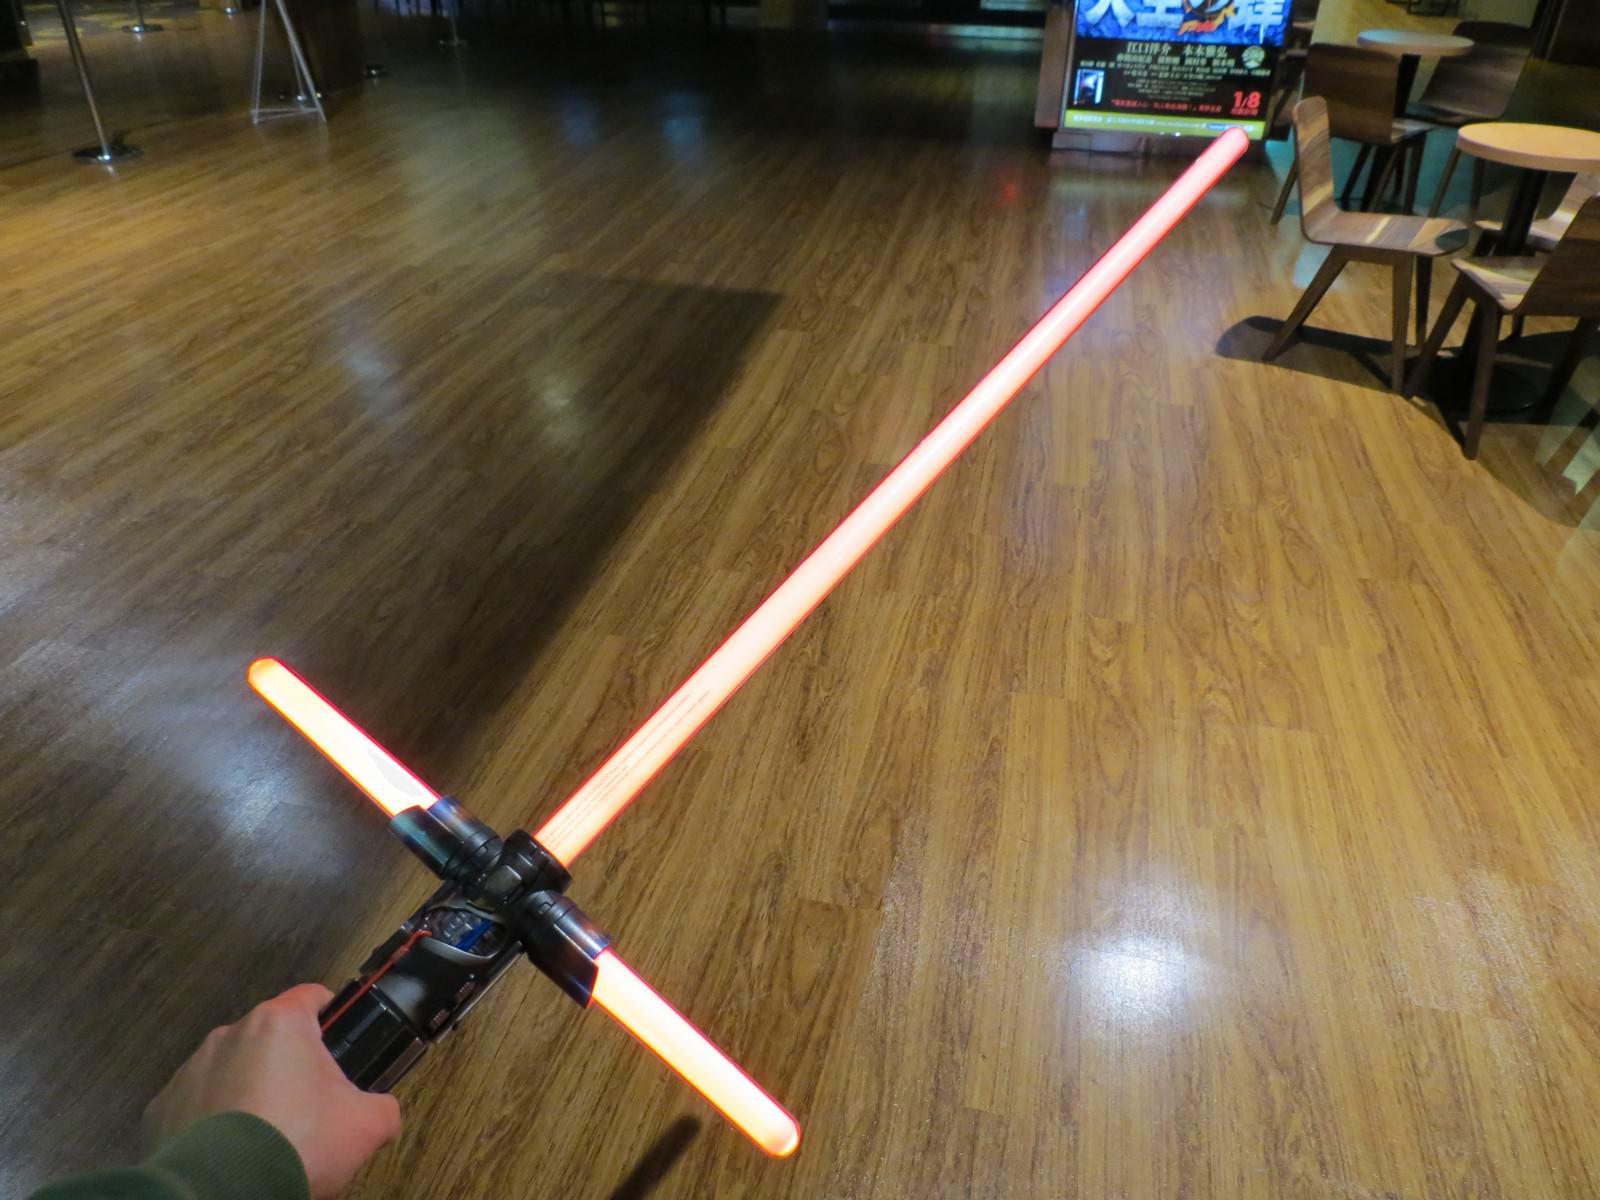 Movie, Star Wars: The Force Awakens(美國, 2015) / STAR WARS:原力覺醒(台灣) / 星球大战:原力觉醒(中國) / 星球大戰:原力覺醒(香港), 廣告看板, 喜樂時代影城